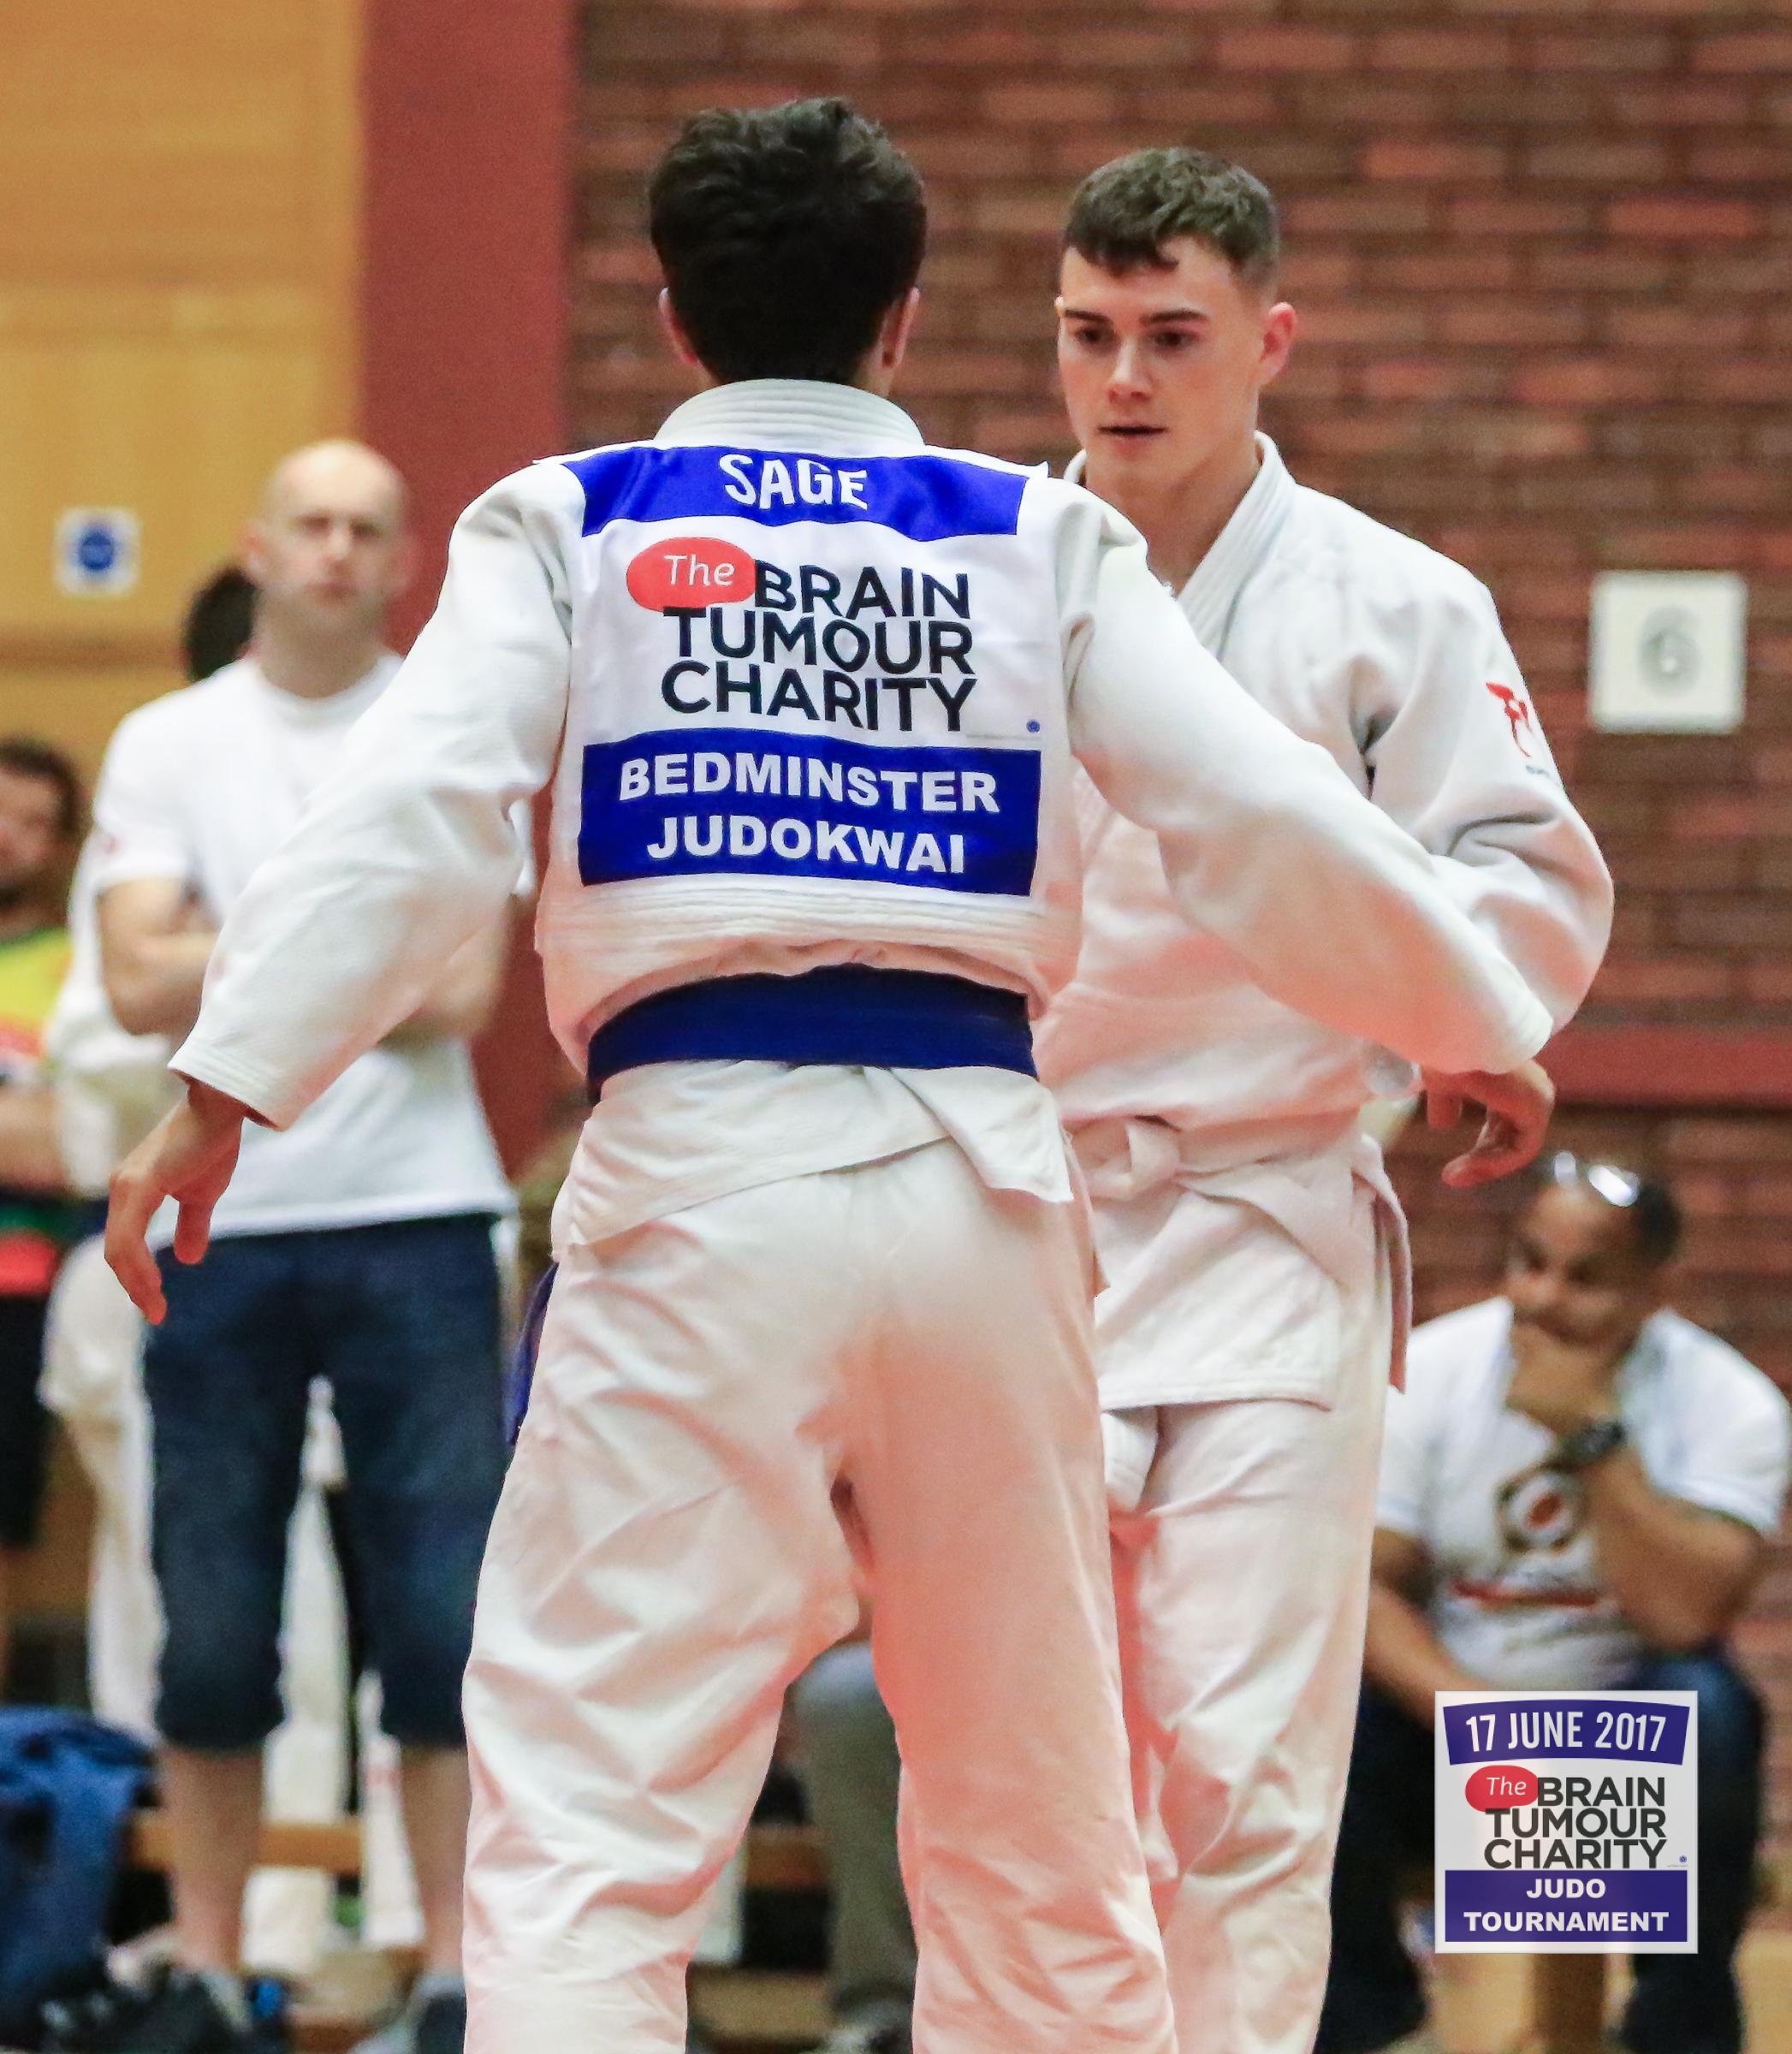 DM_0292_Charity_judo